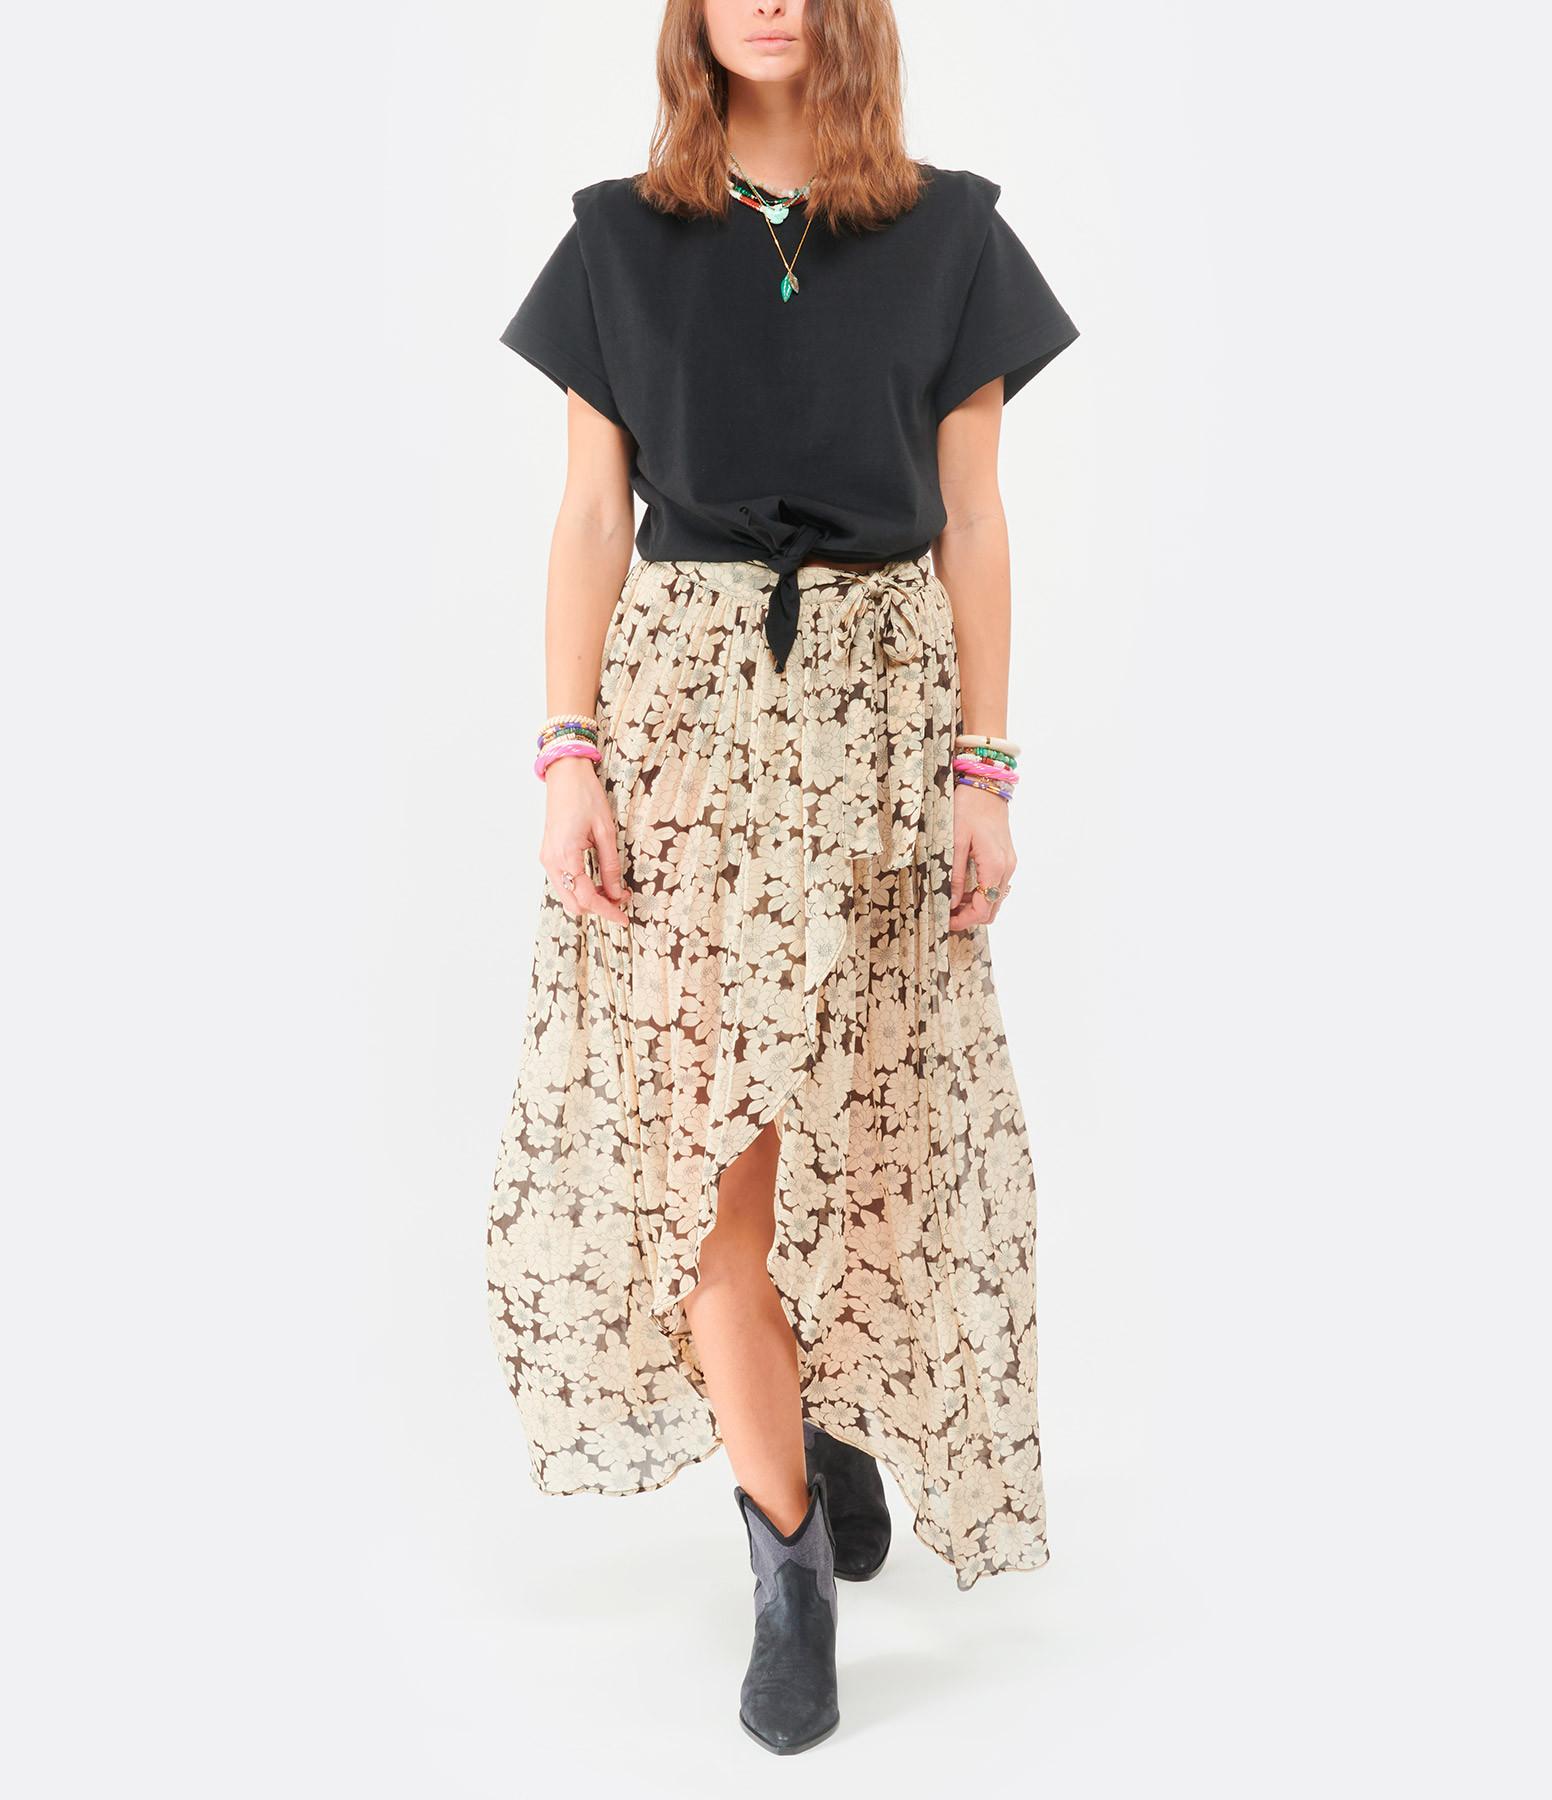 ISABEL MARANT - Tee-shirt Zelito Coton Noir